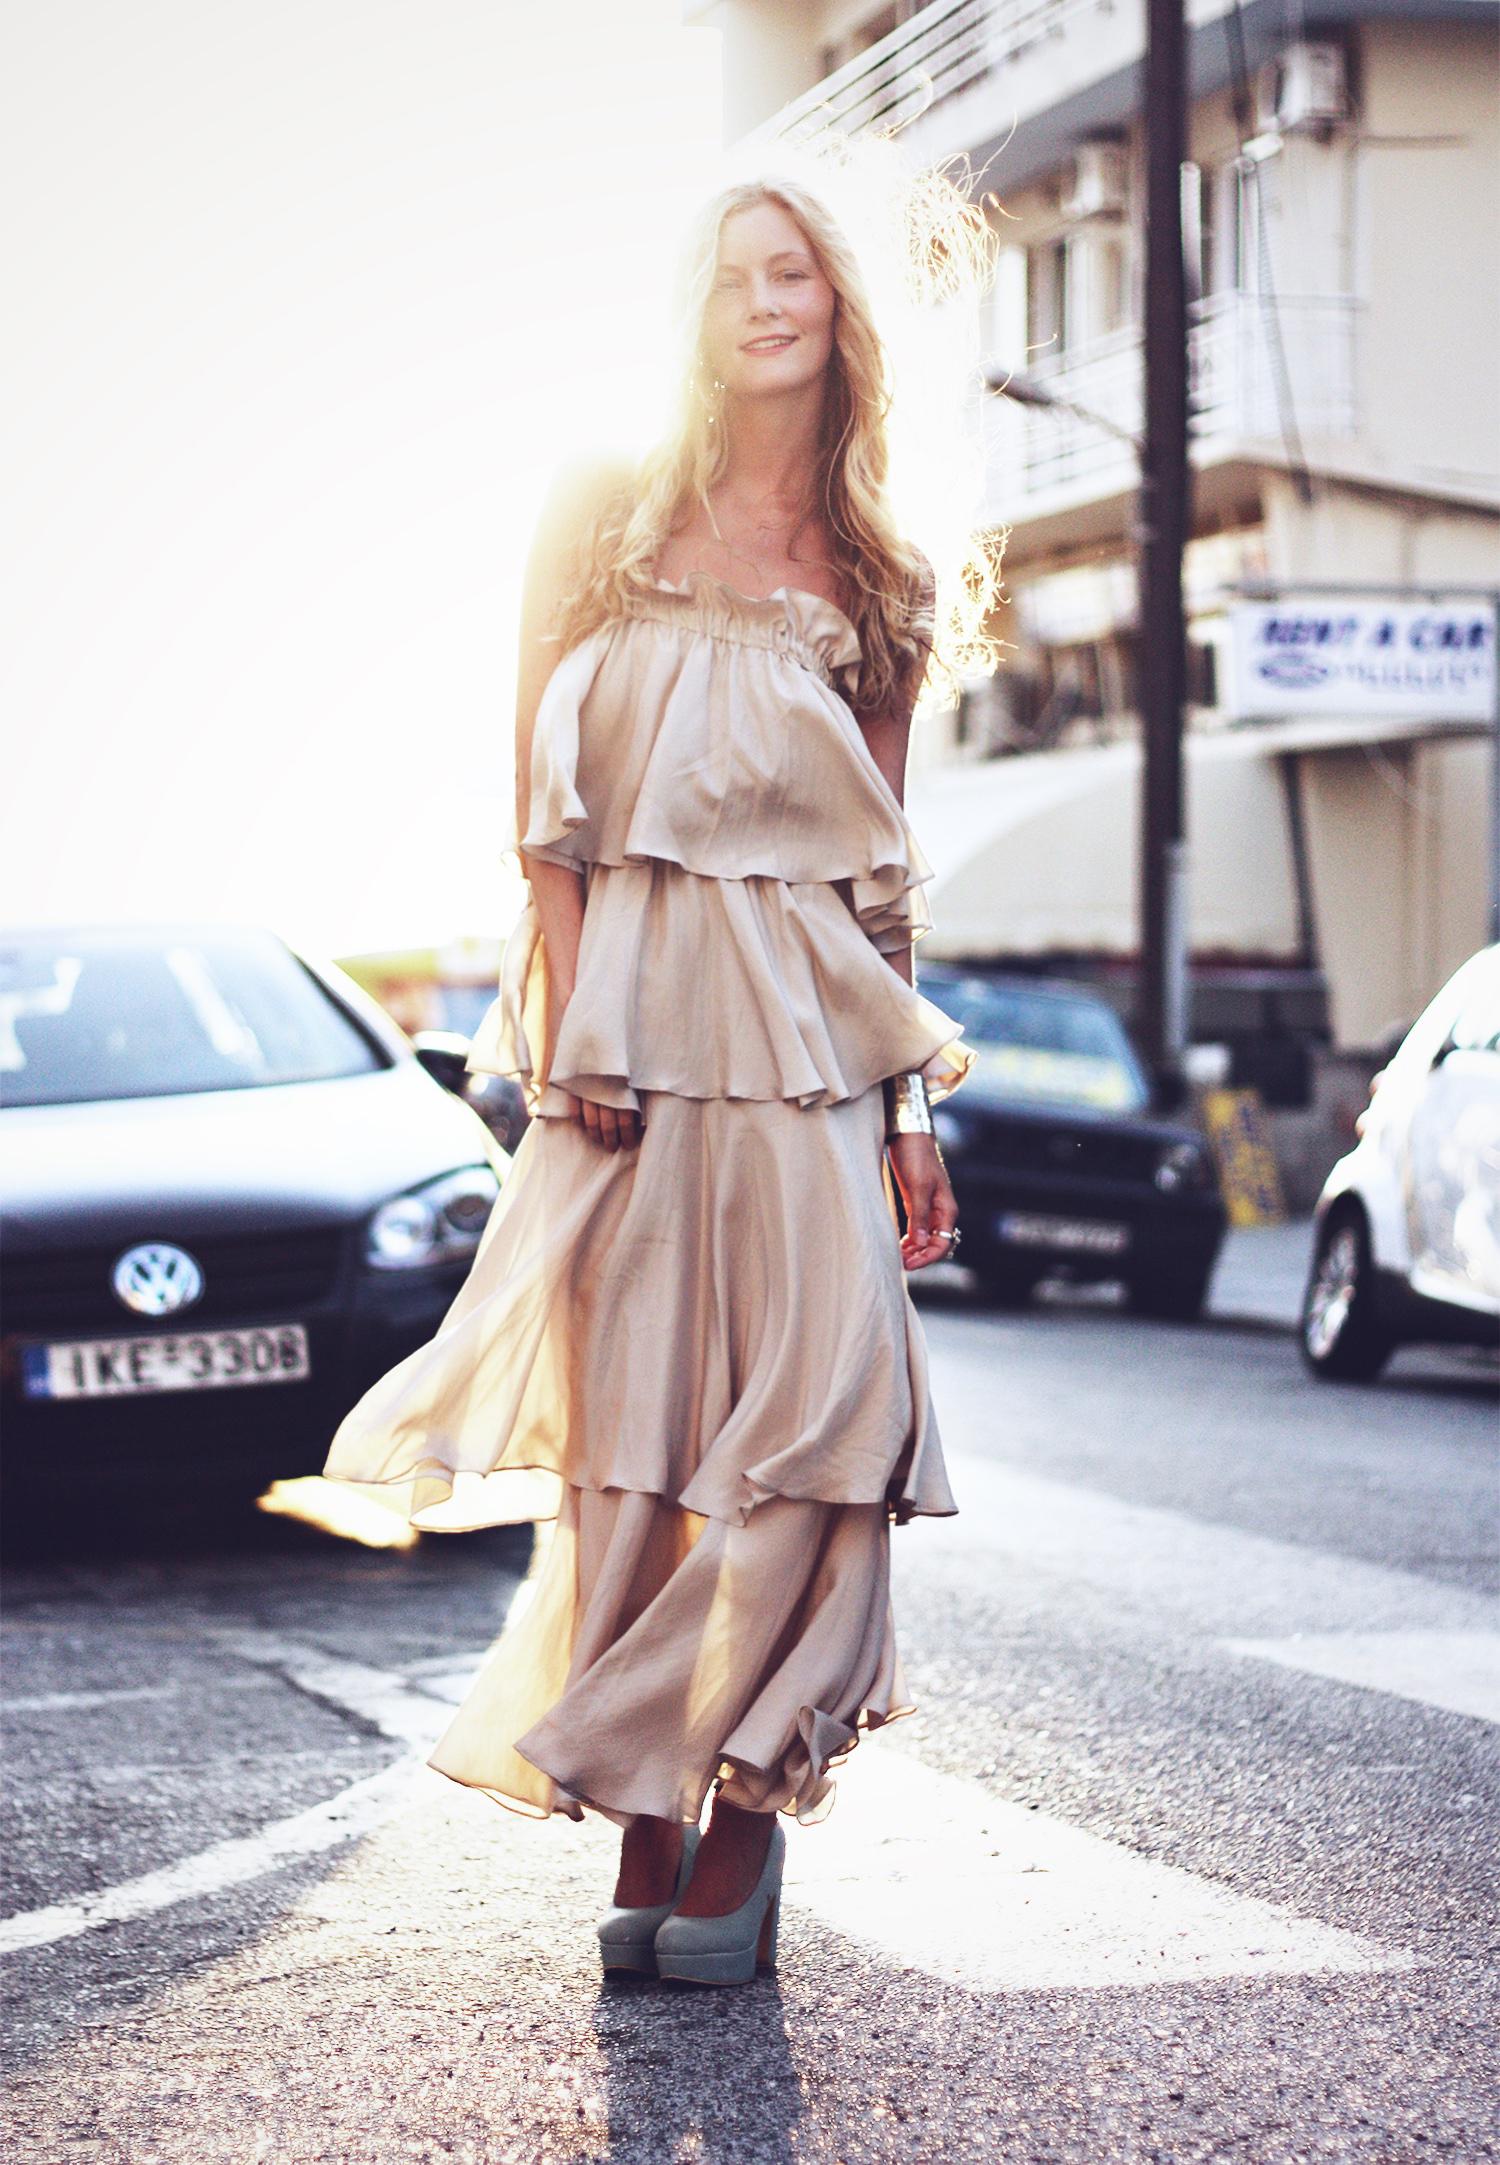 stropløs-kjole